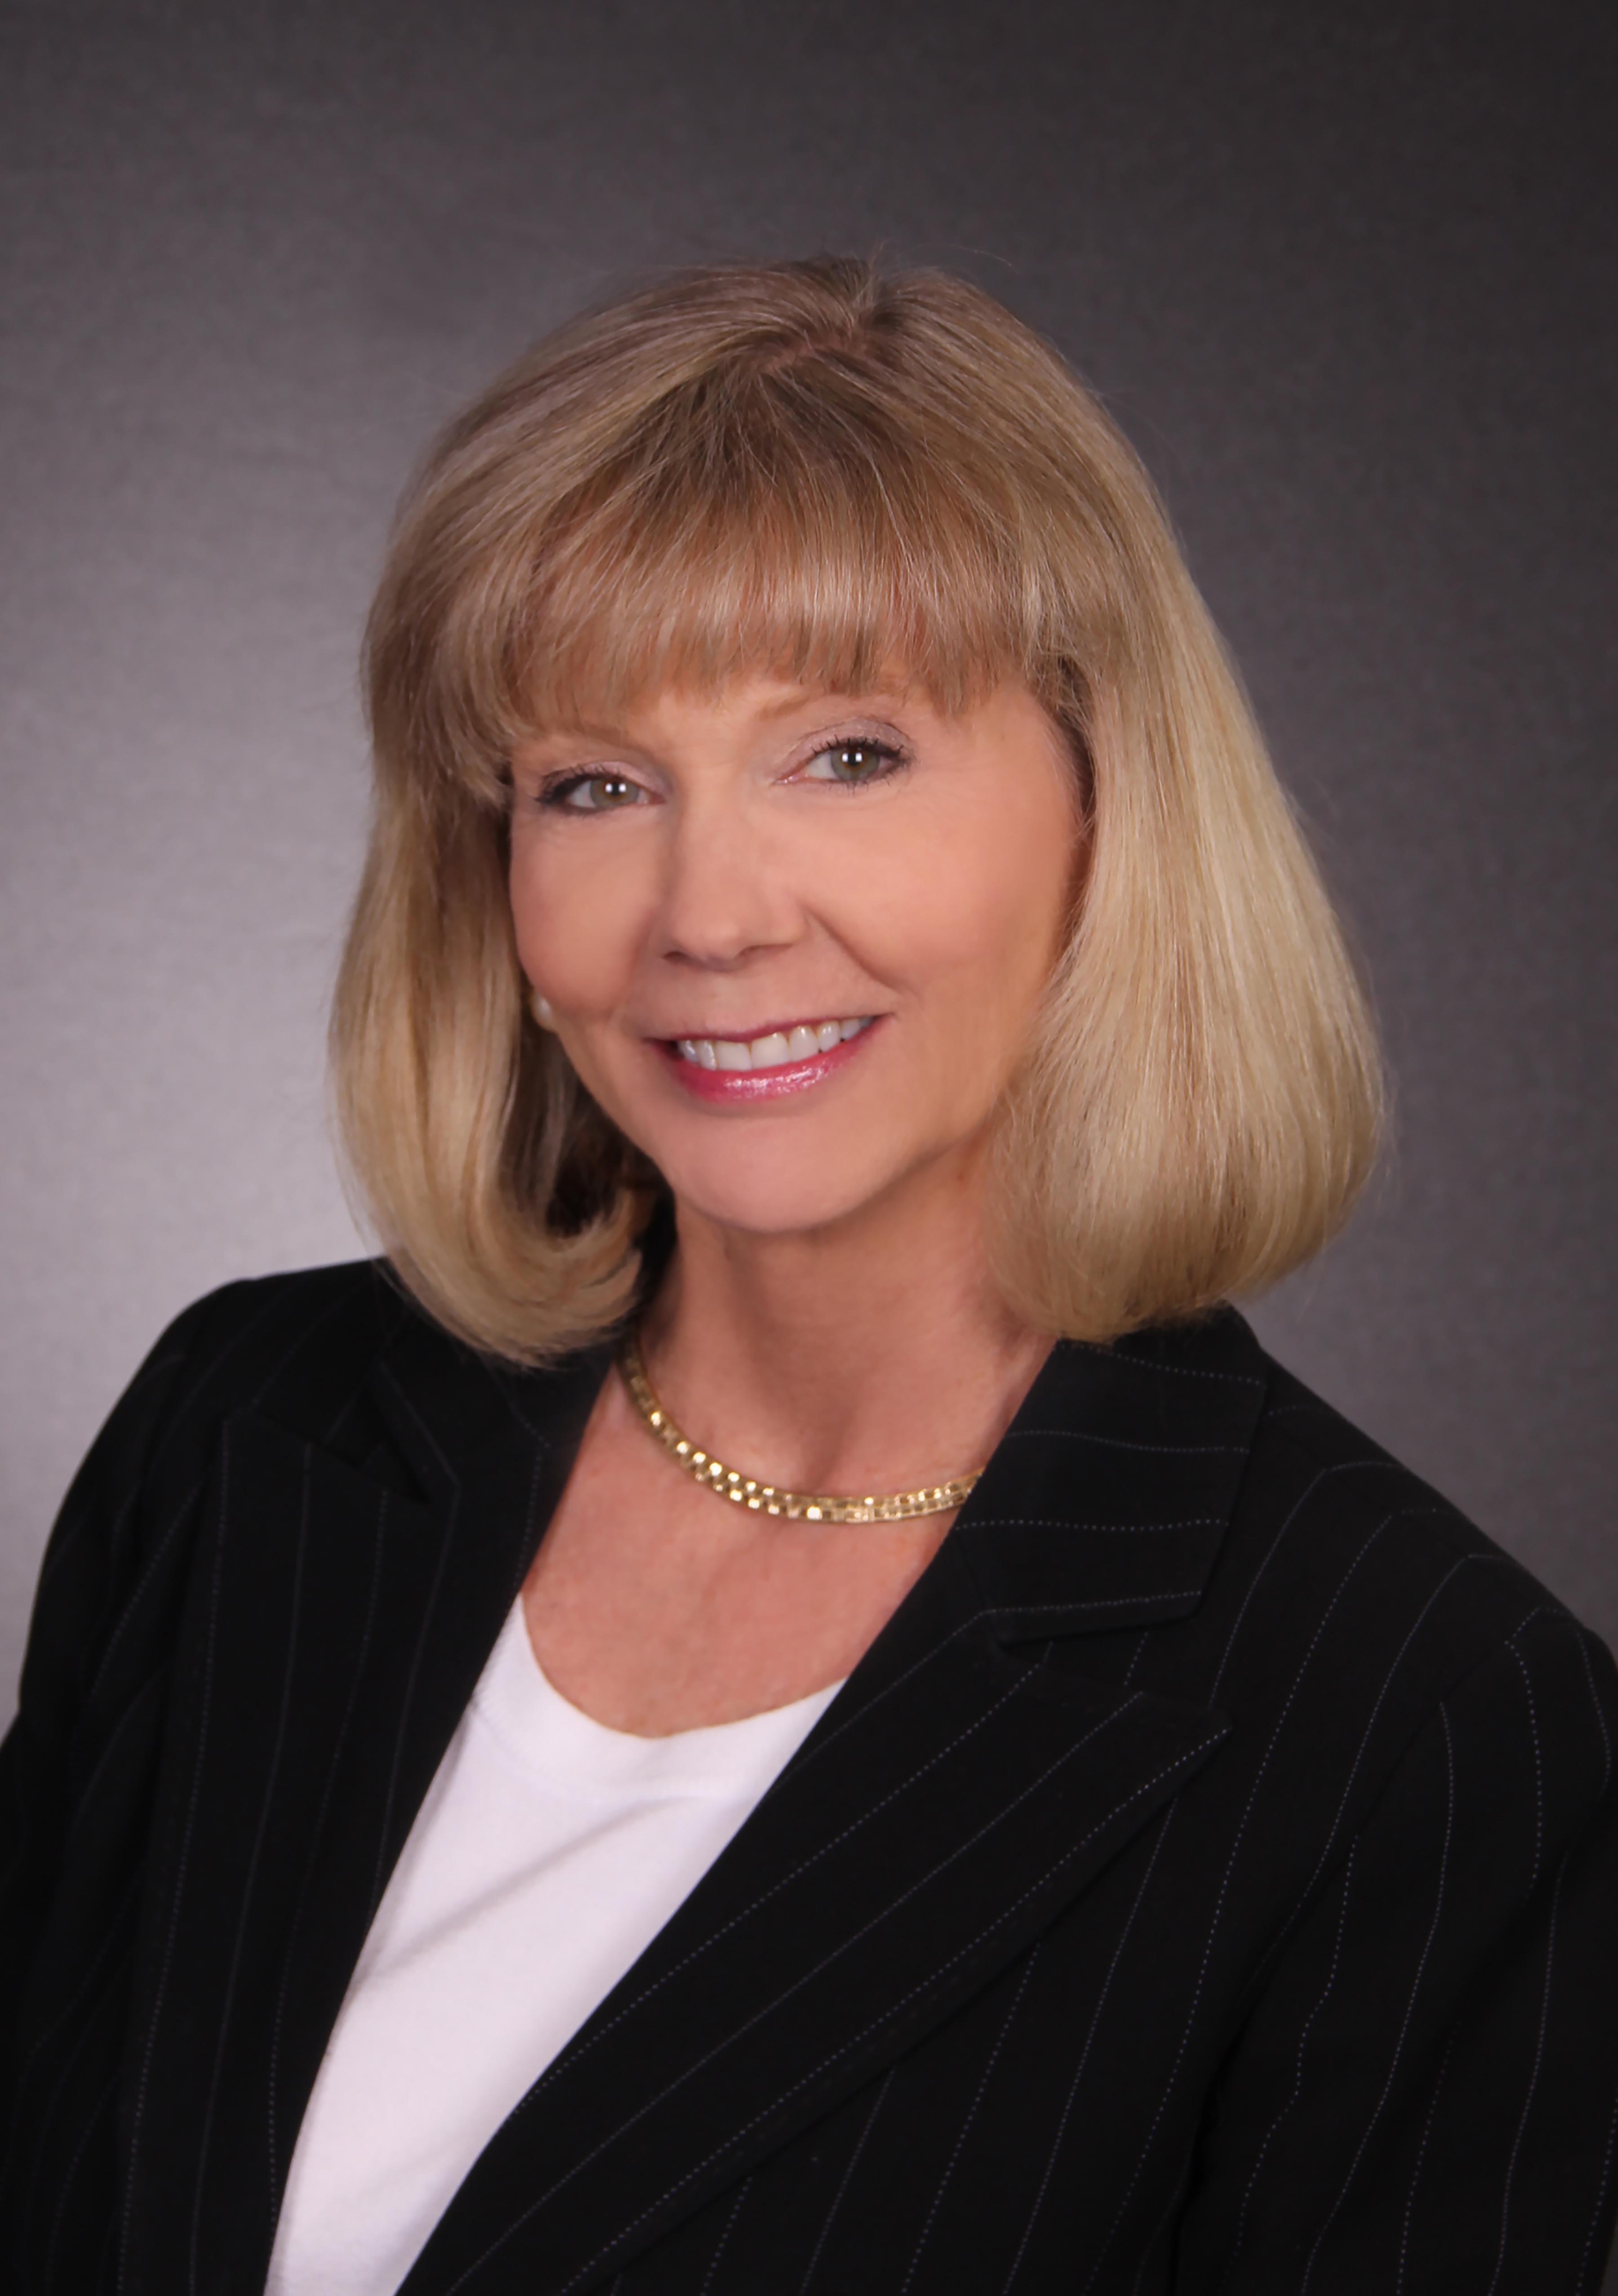 Pam Madigan